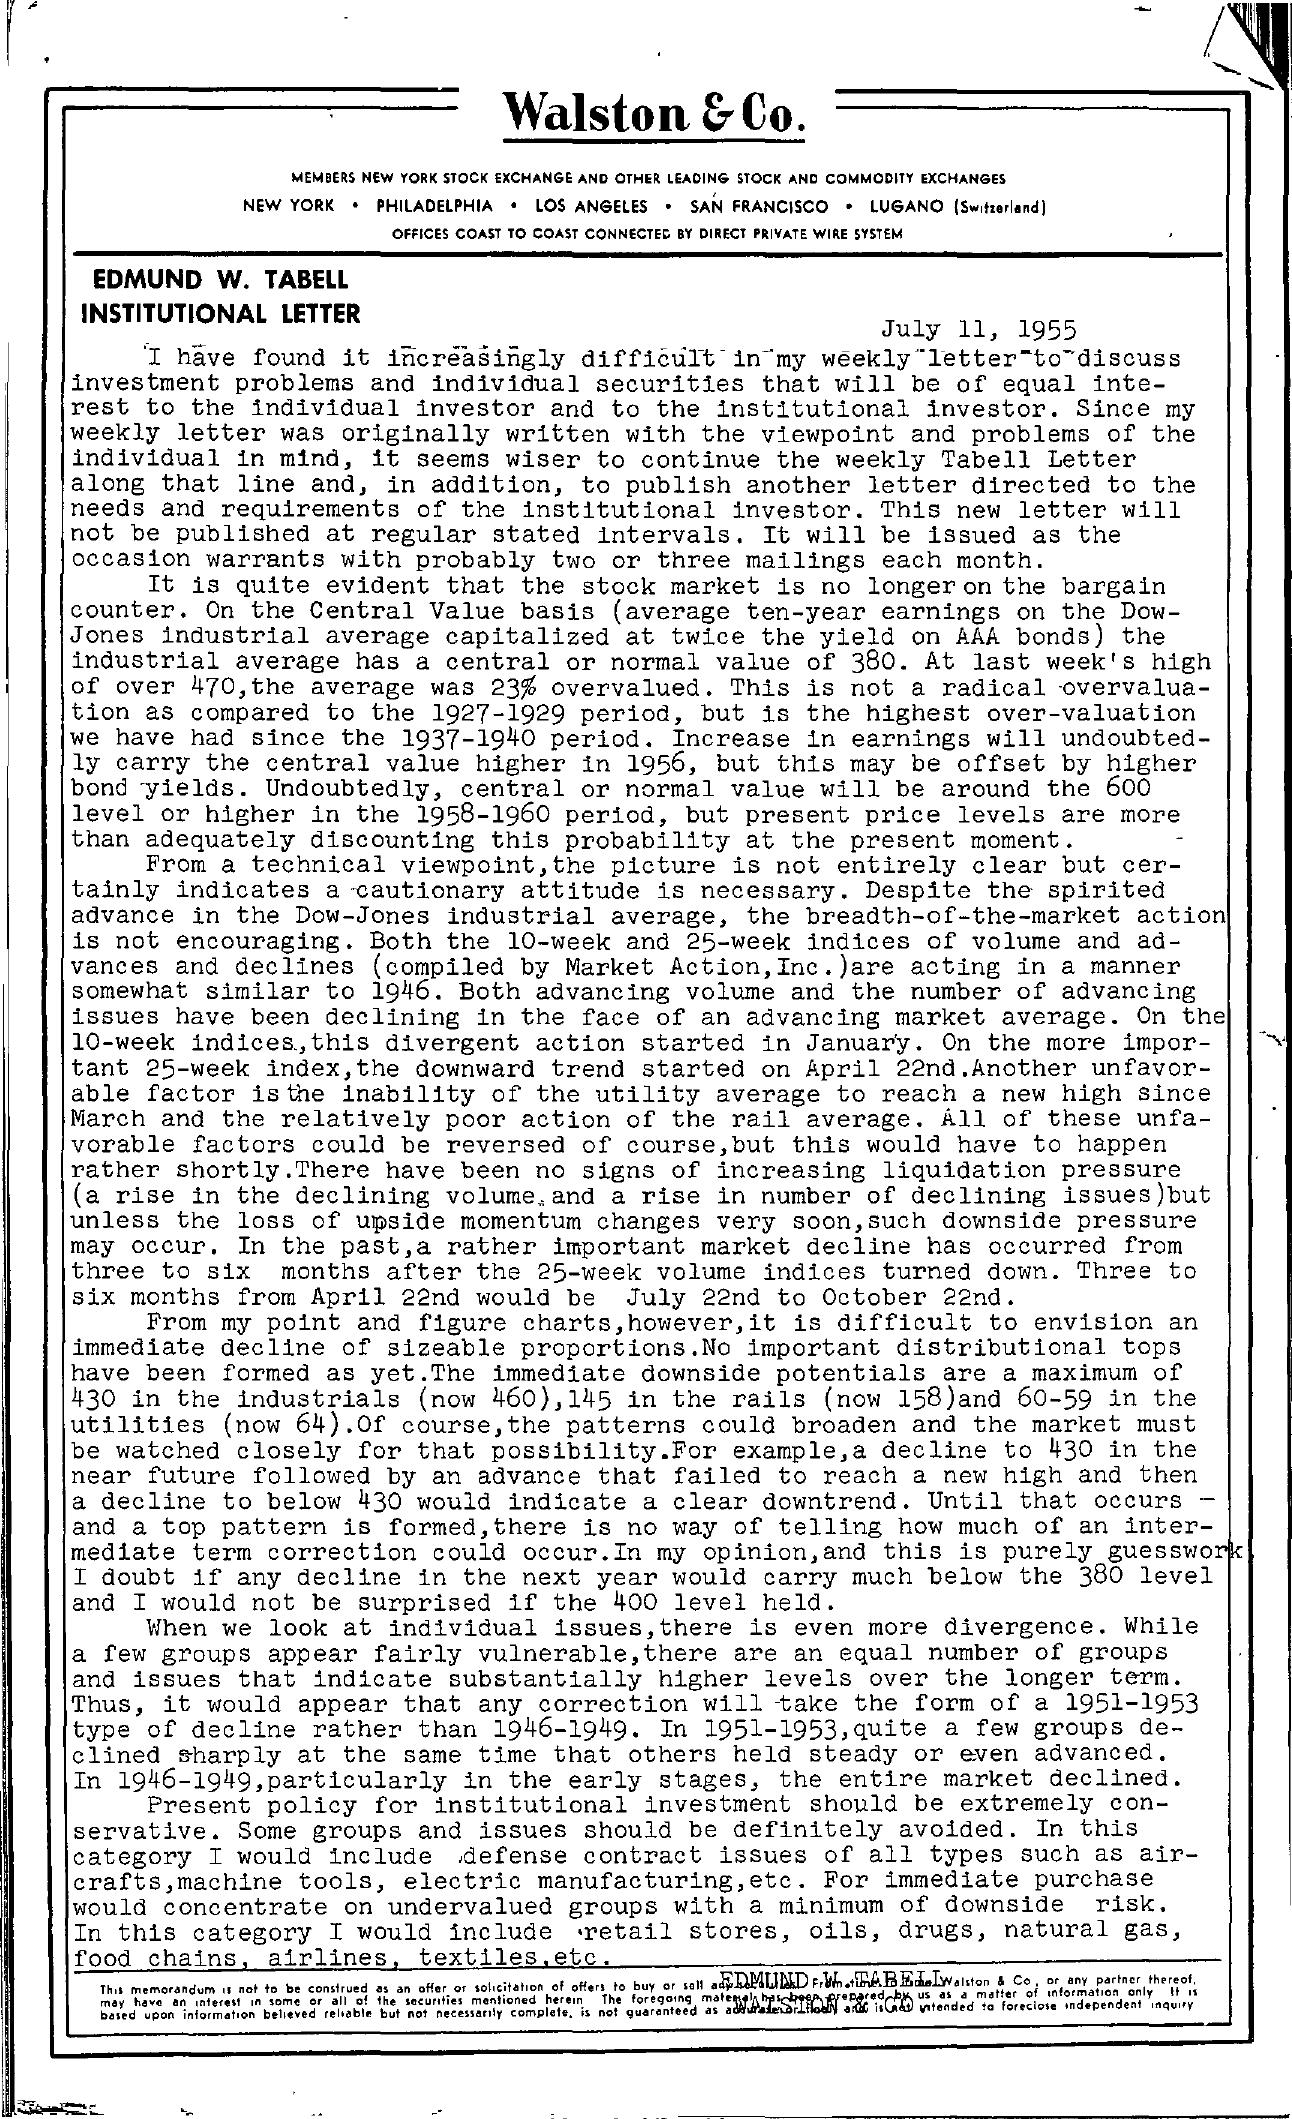 Tabell's Market Letter - July 11, 1955